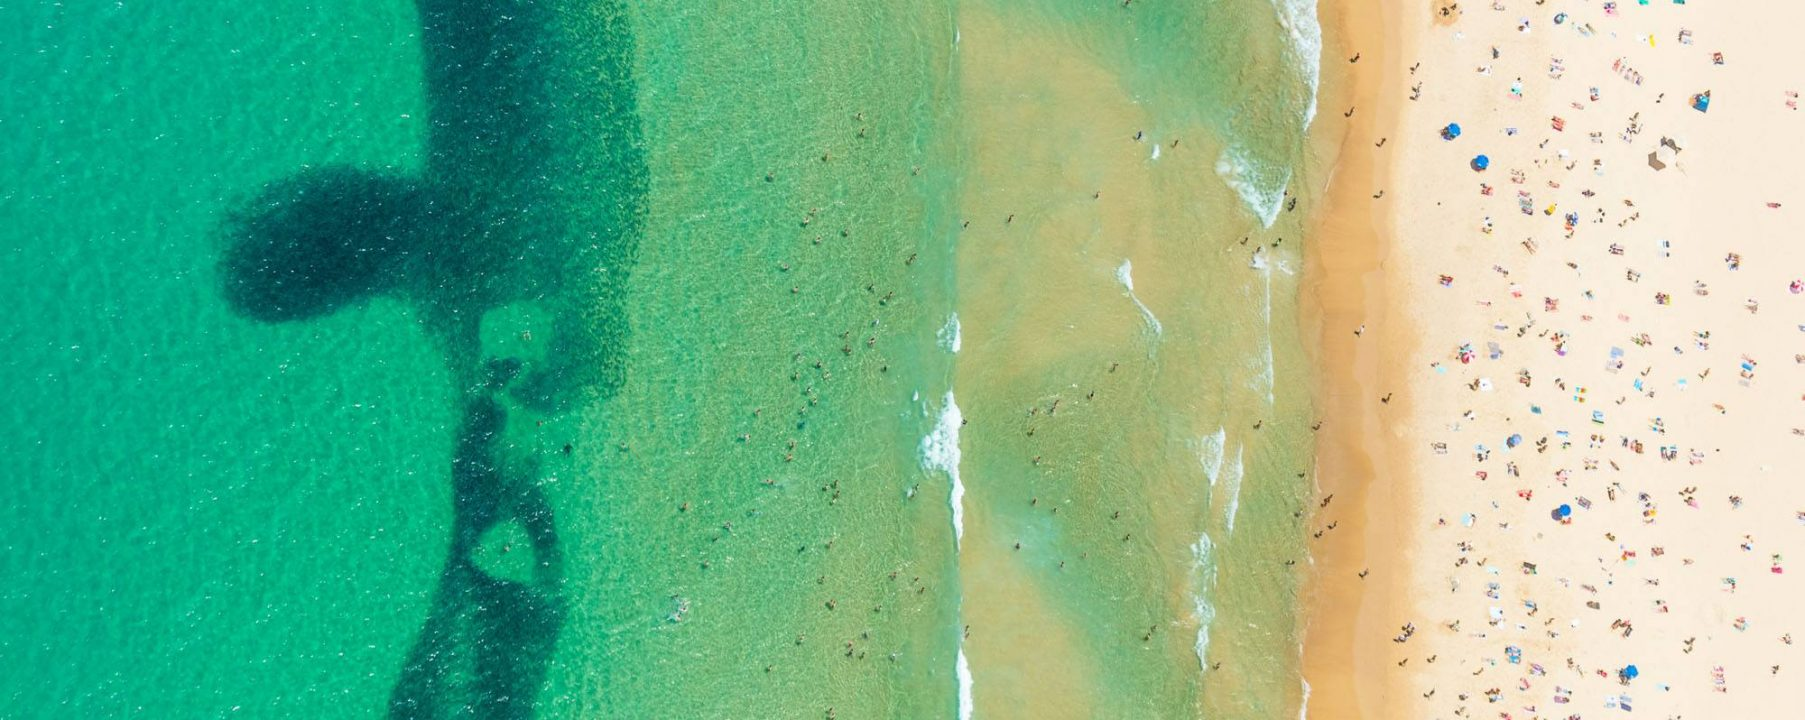 Bondi Beach Sydney Aerial Photograph